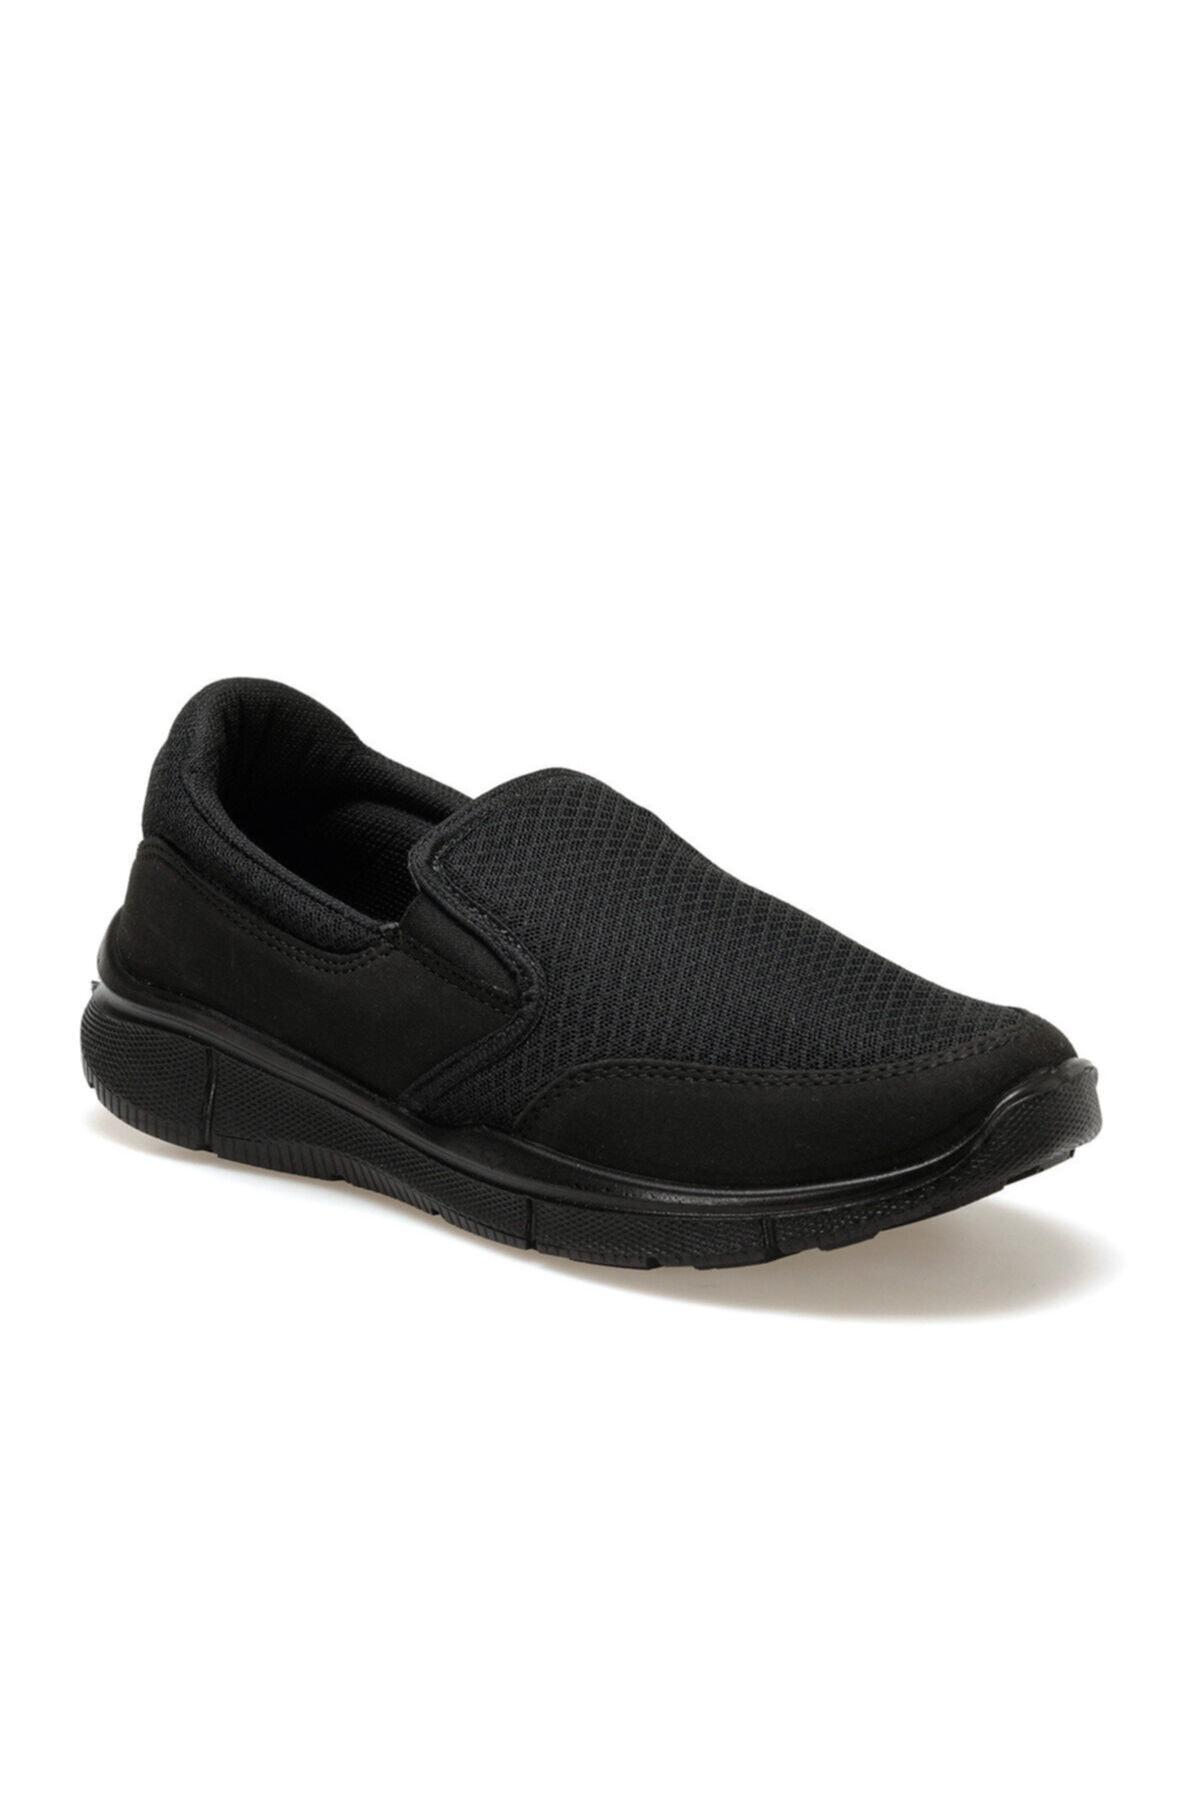 PANAMA CLUB Slp501 Siyah Erkek Slip On Ayakkabı 1